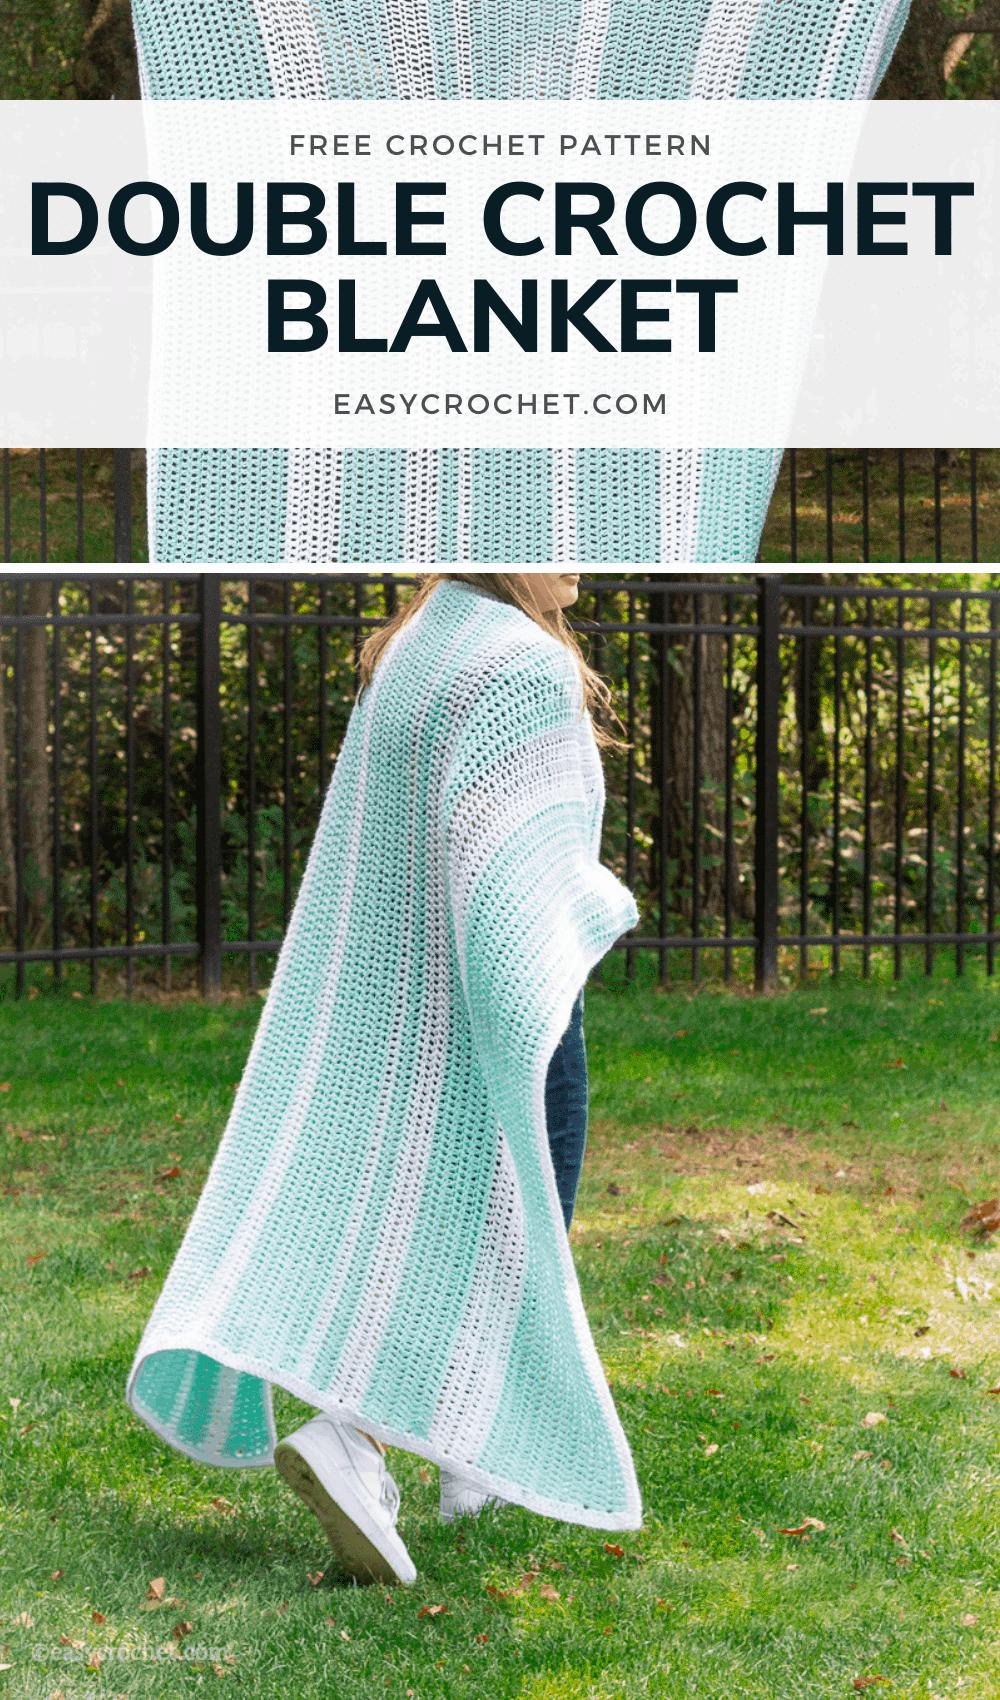 Free Double Crochet Blanket Pattern using Medium Weight Yarn